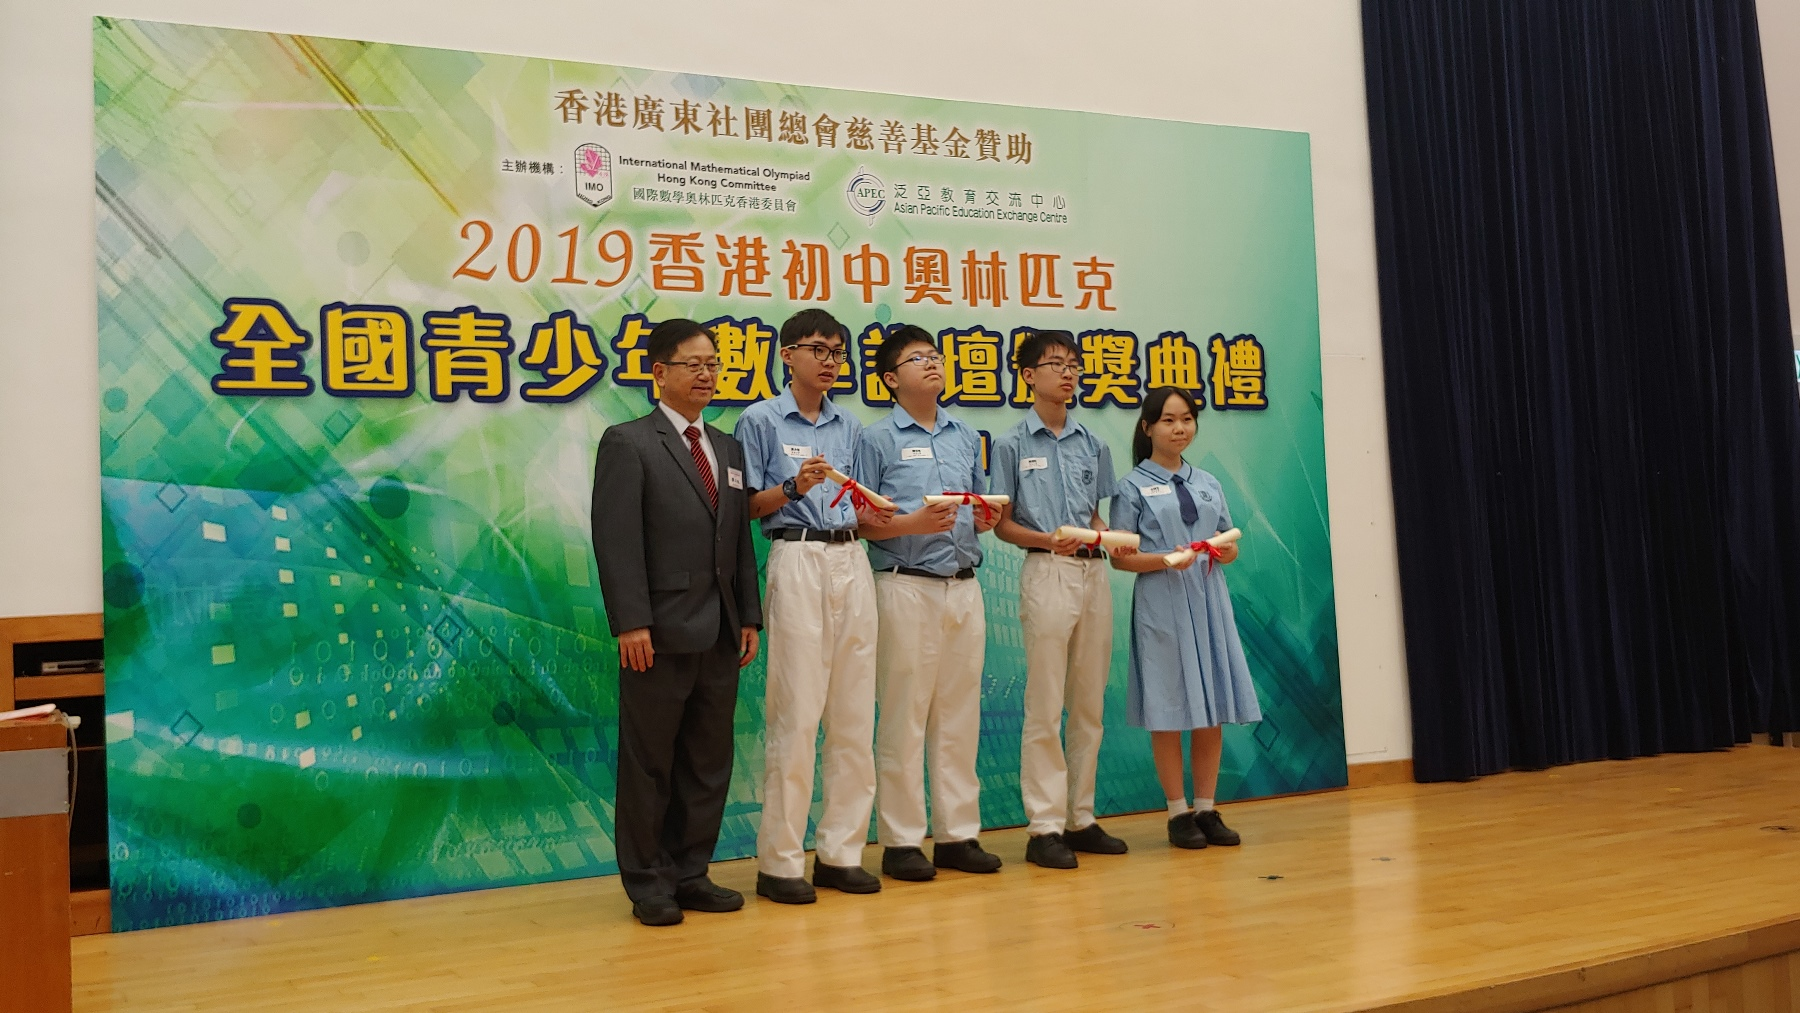 http://npc.edu.hk/sites/default/files/20190622_104915.jpg